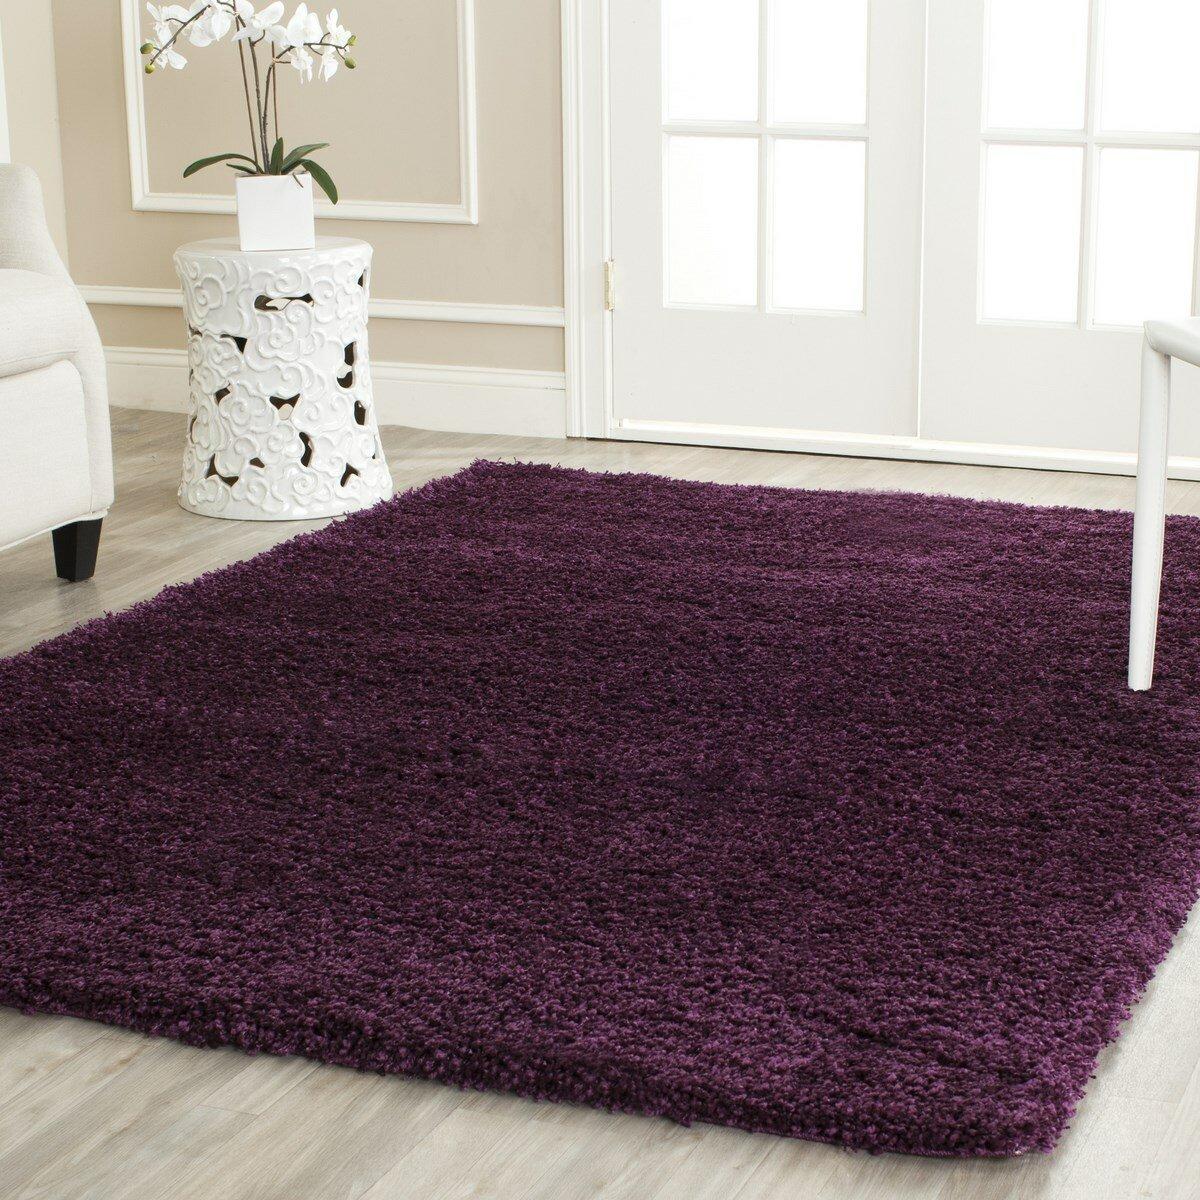 House of Hampton Ampthill Shag Purple Area Rug & Reviews